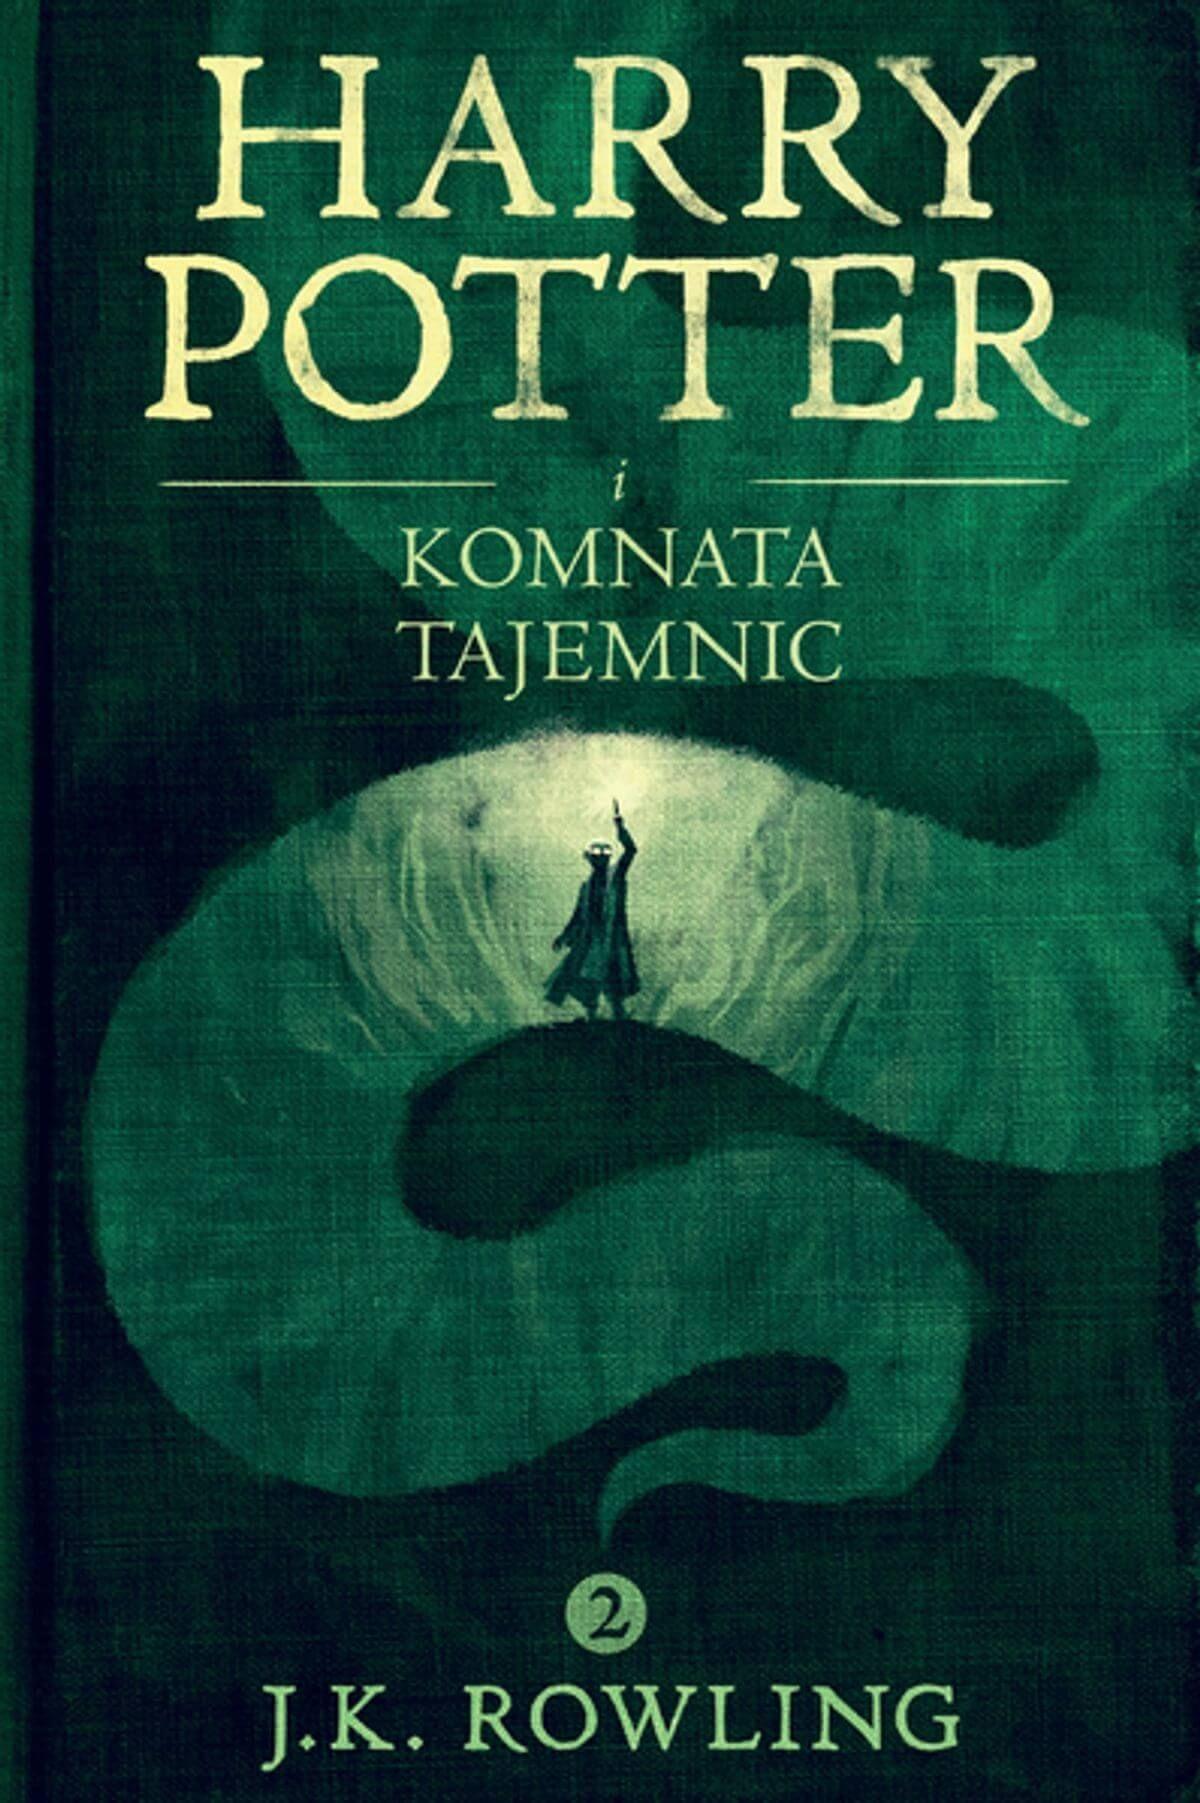 Harry Potter I Komnata Tajemnic Ebook Harry Potter Book Covers Chamber Of Secrets The Secret Book